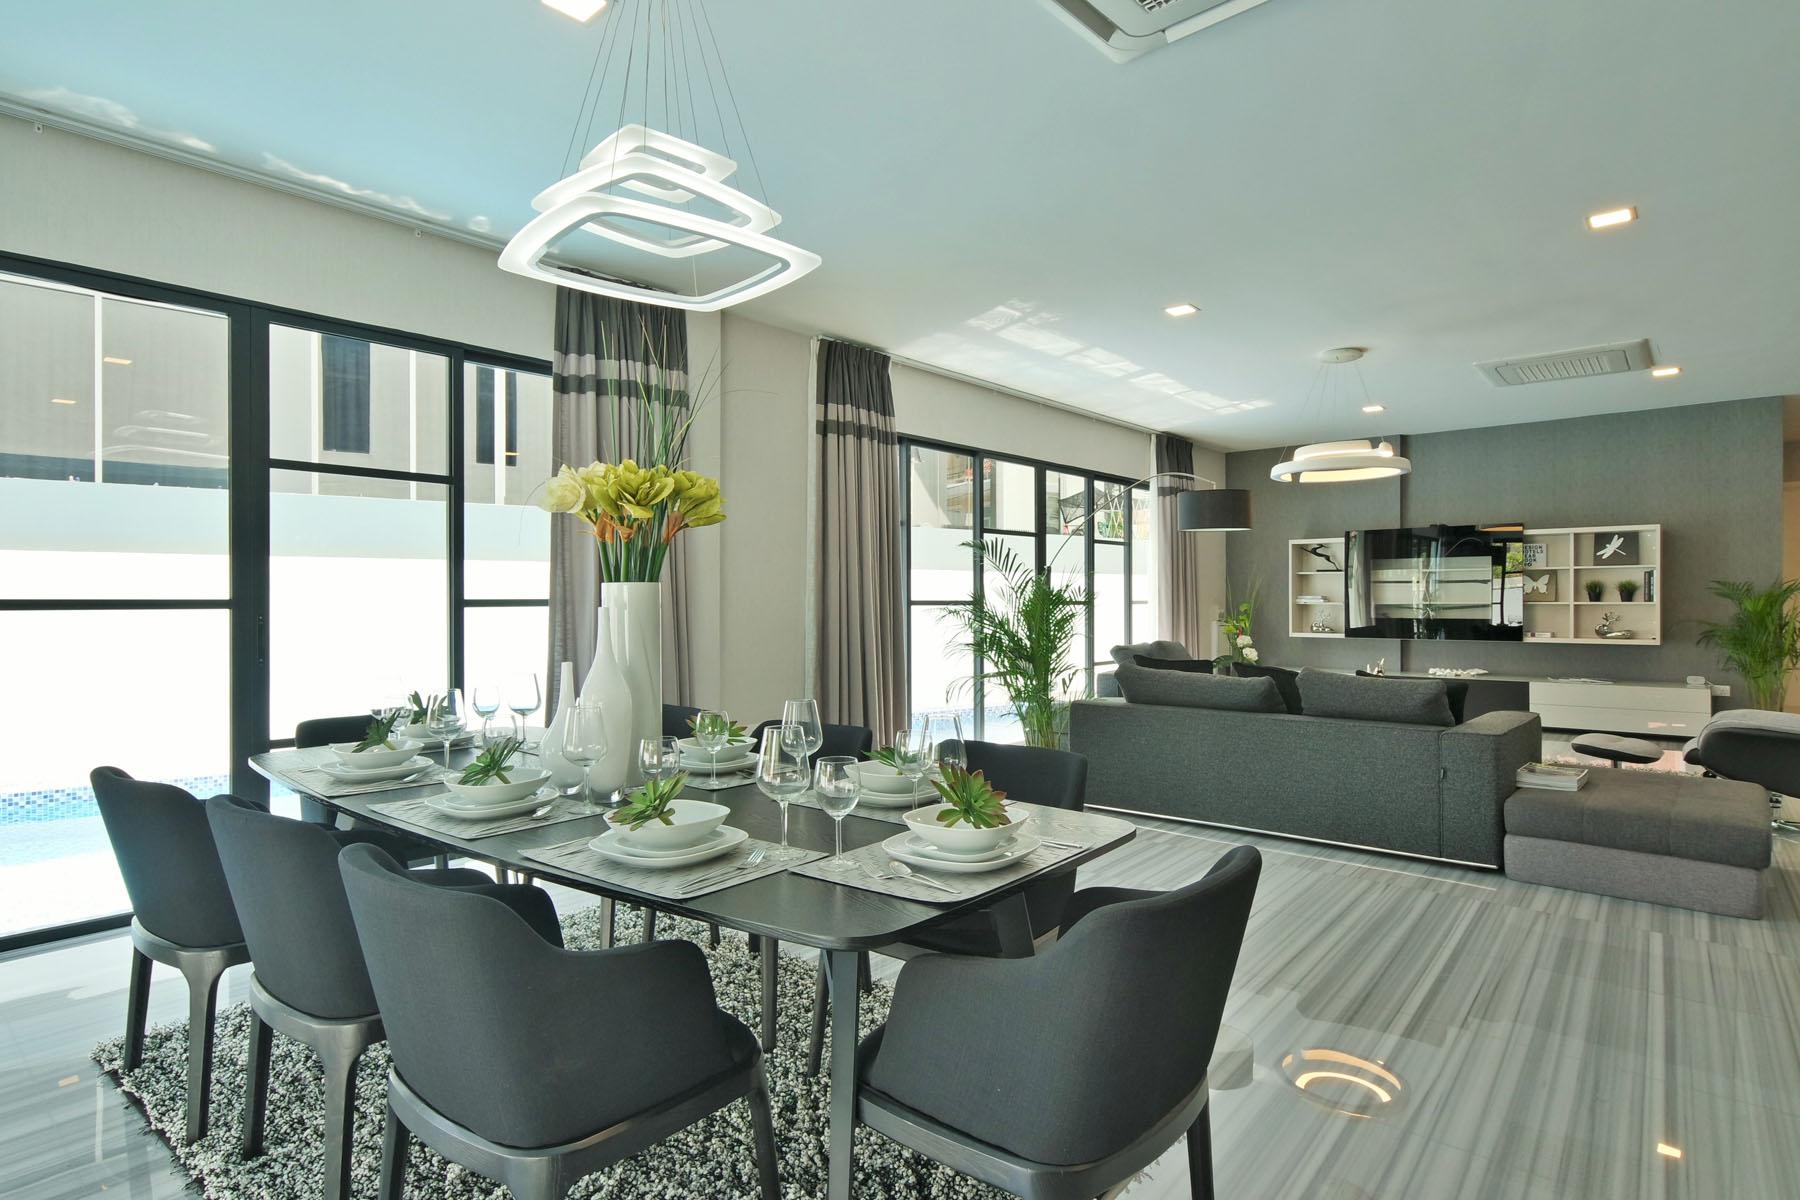 Dining area designs